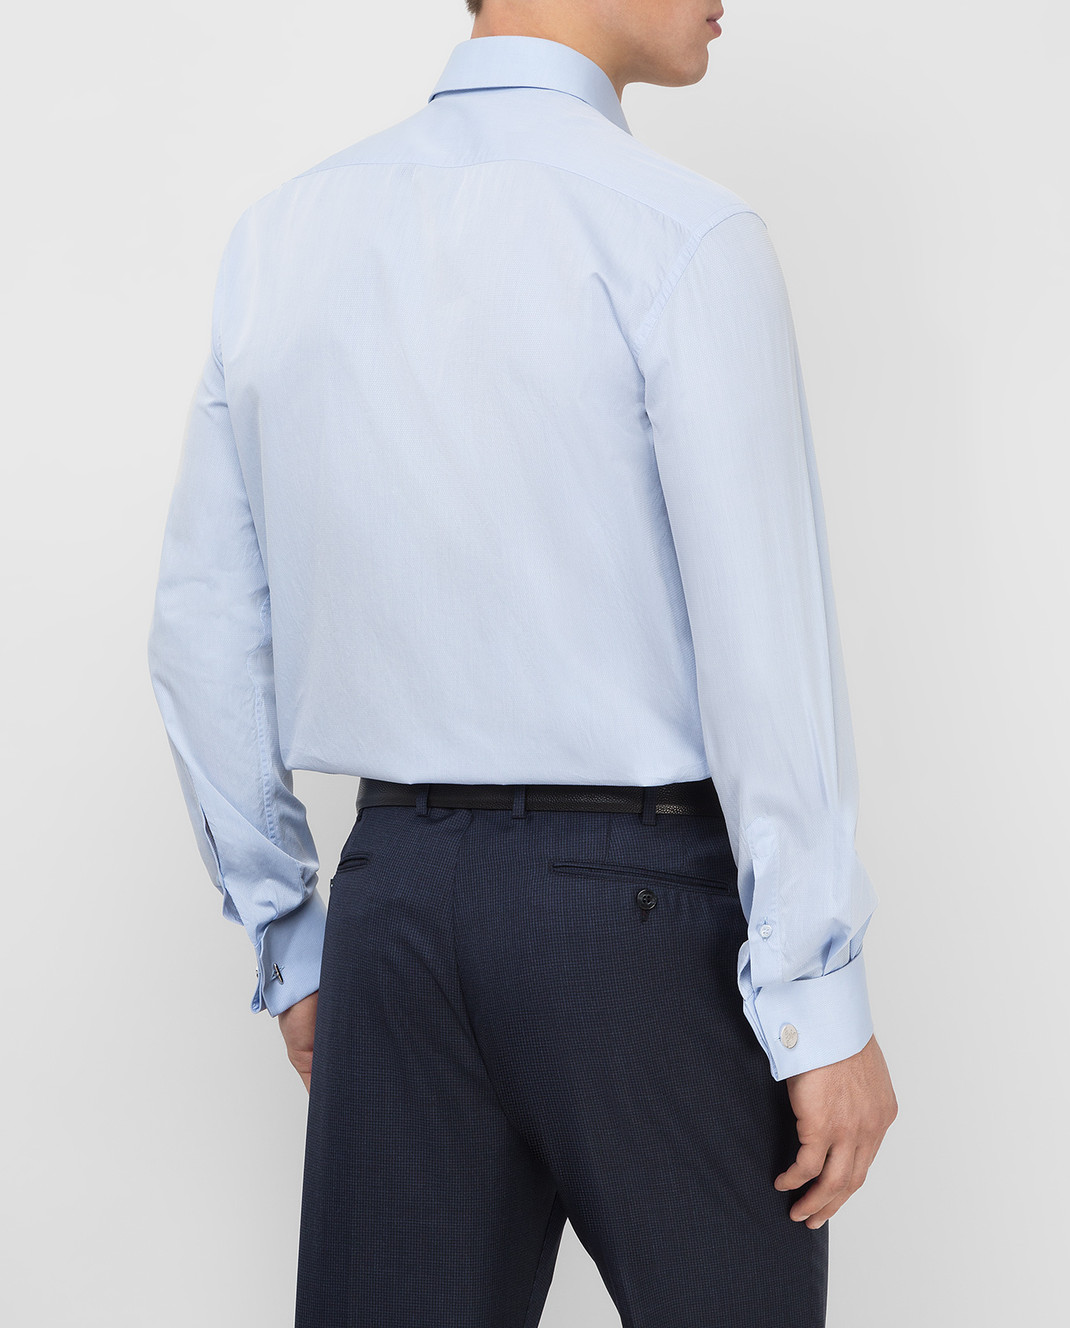 Stefano Ricci Голубая рубашка MC000591L1601 изображение 4